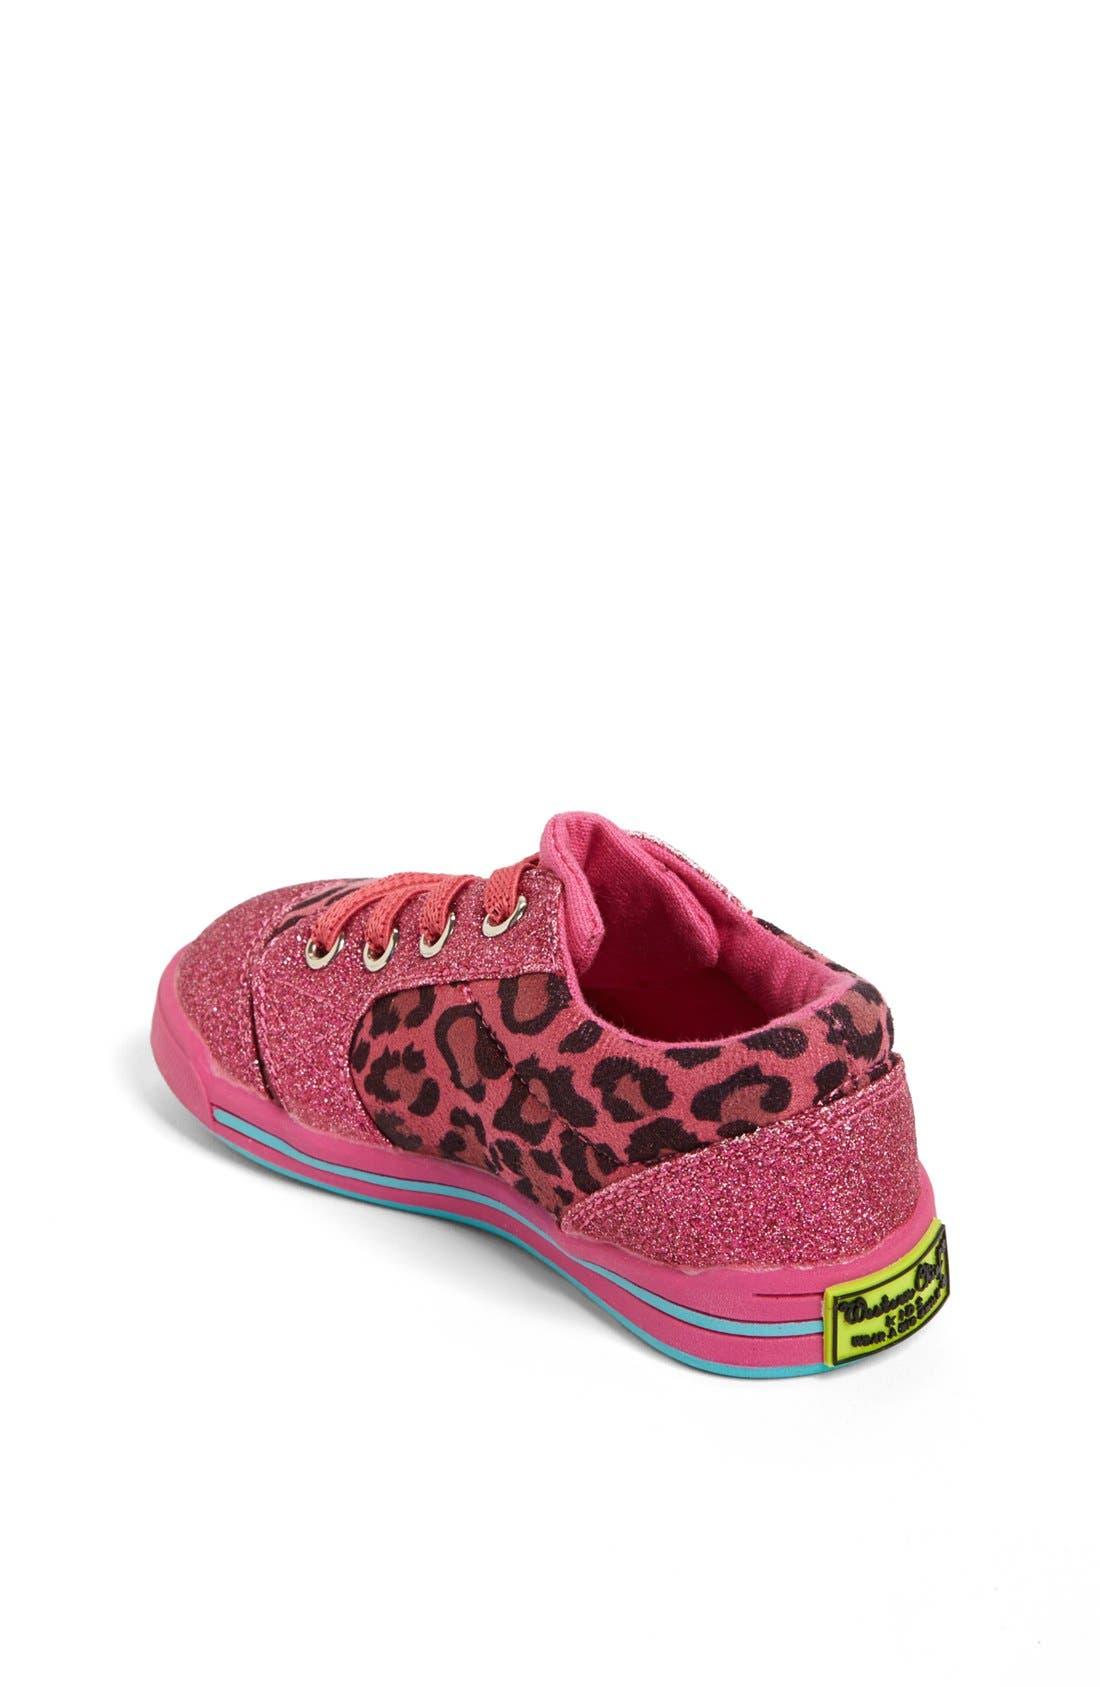 Alternate Image 2  - Western Chief 'Flashy Leopard' Sneaker (Walker & Toddler)